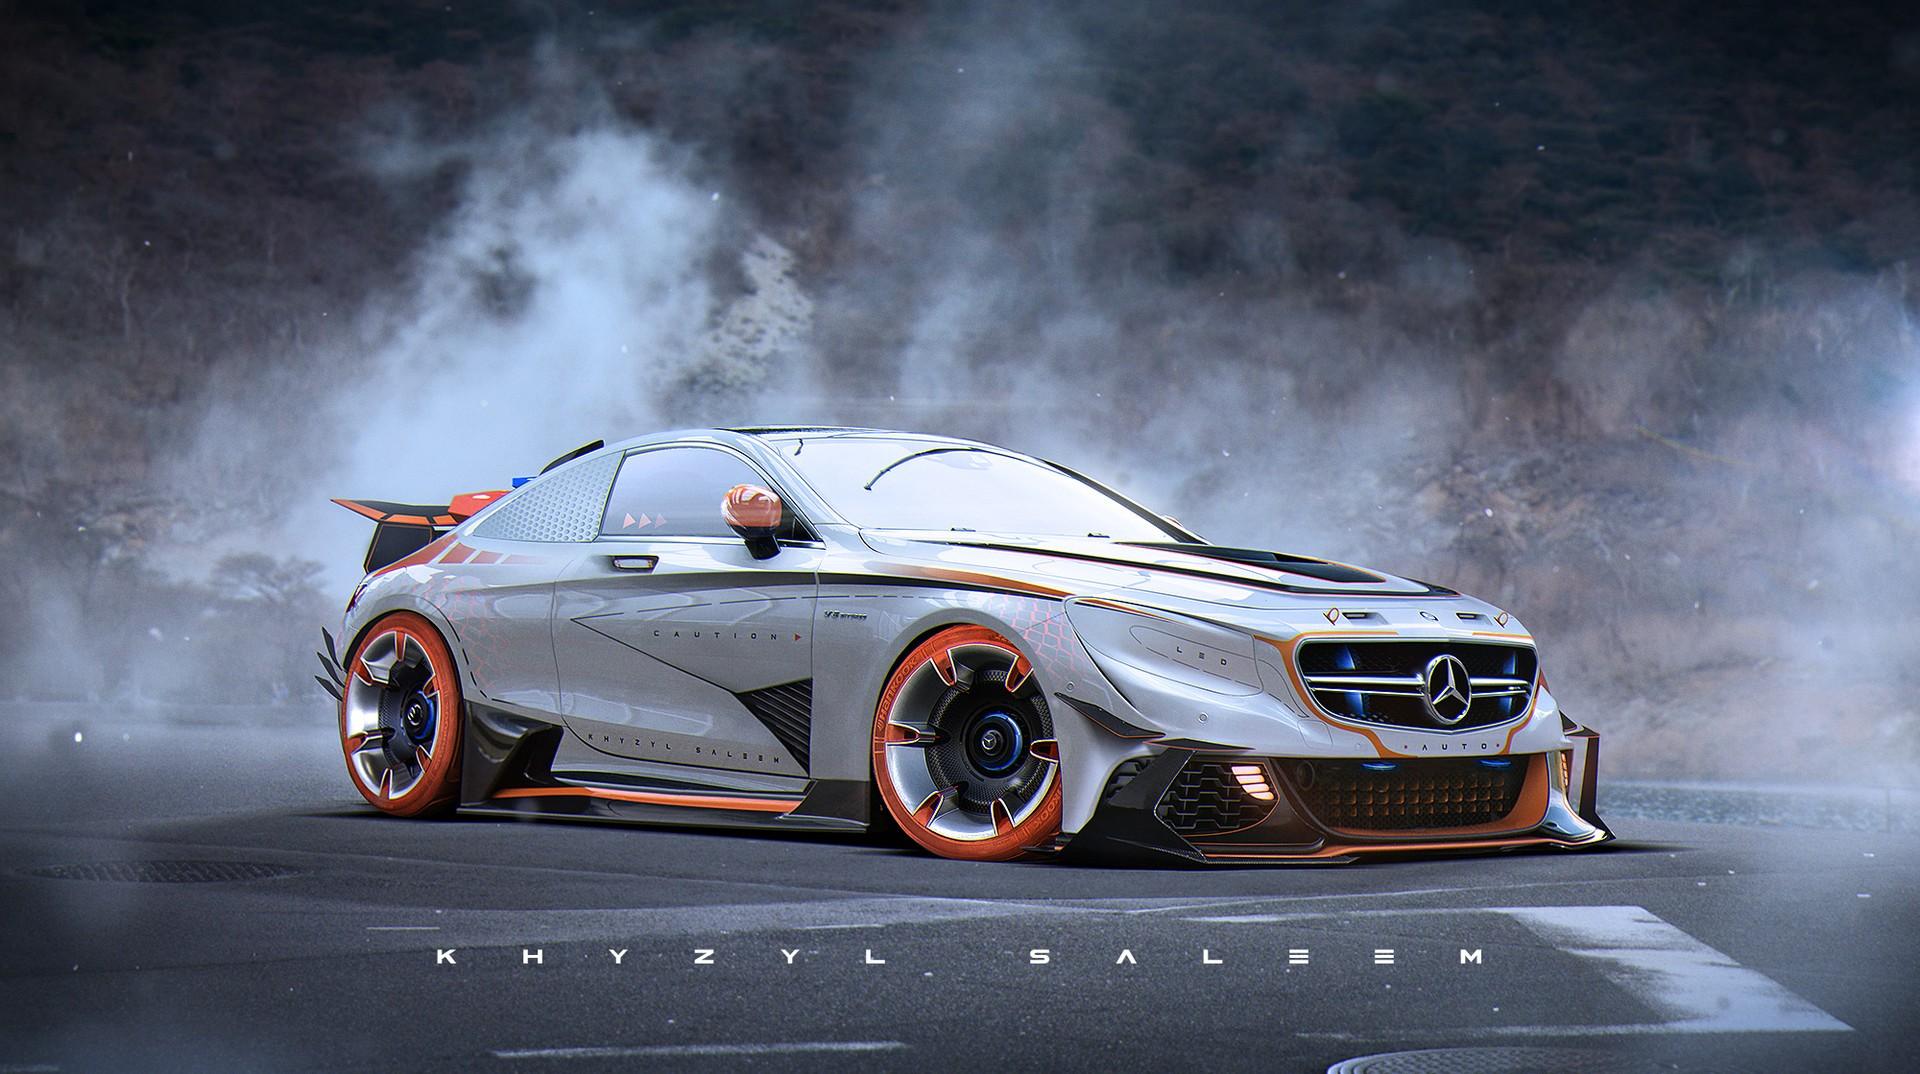 Mazda Furai Vehículos Supercars Hd Fondos De Pantalla: Fondos De Pantalla : Vehículo, Obra De Arte, Mercedes